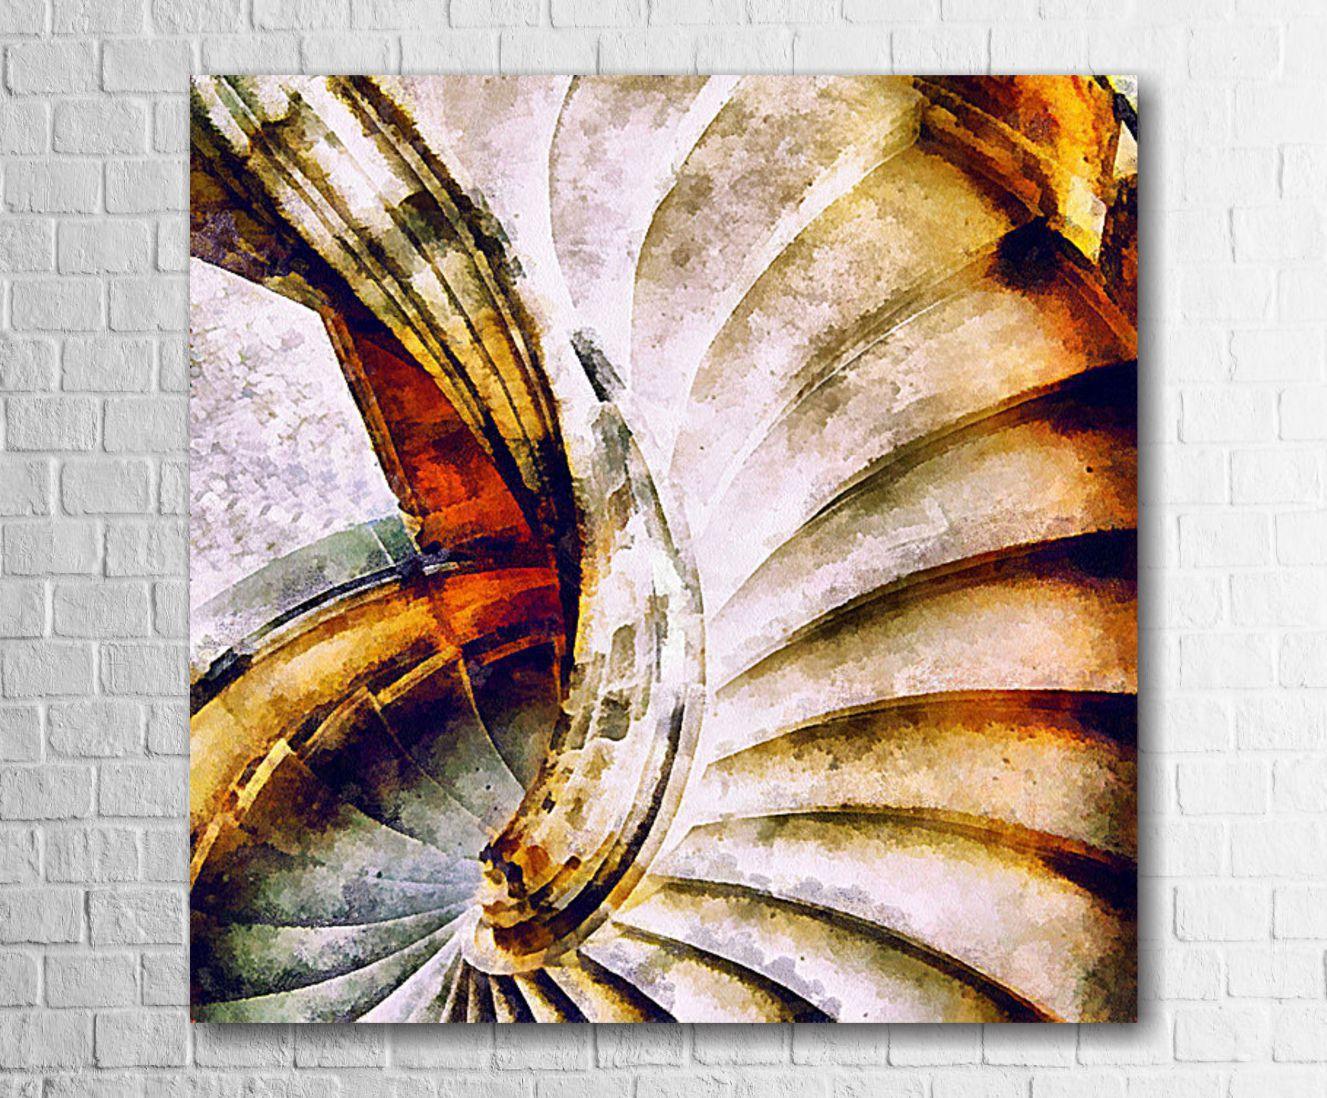 Quadro Decorativo Escada Estilo Pintura 1 peça